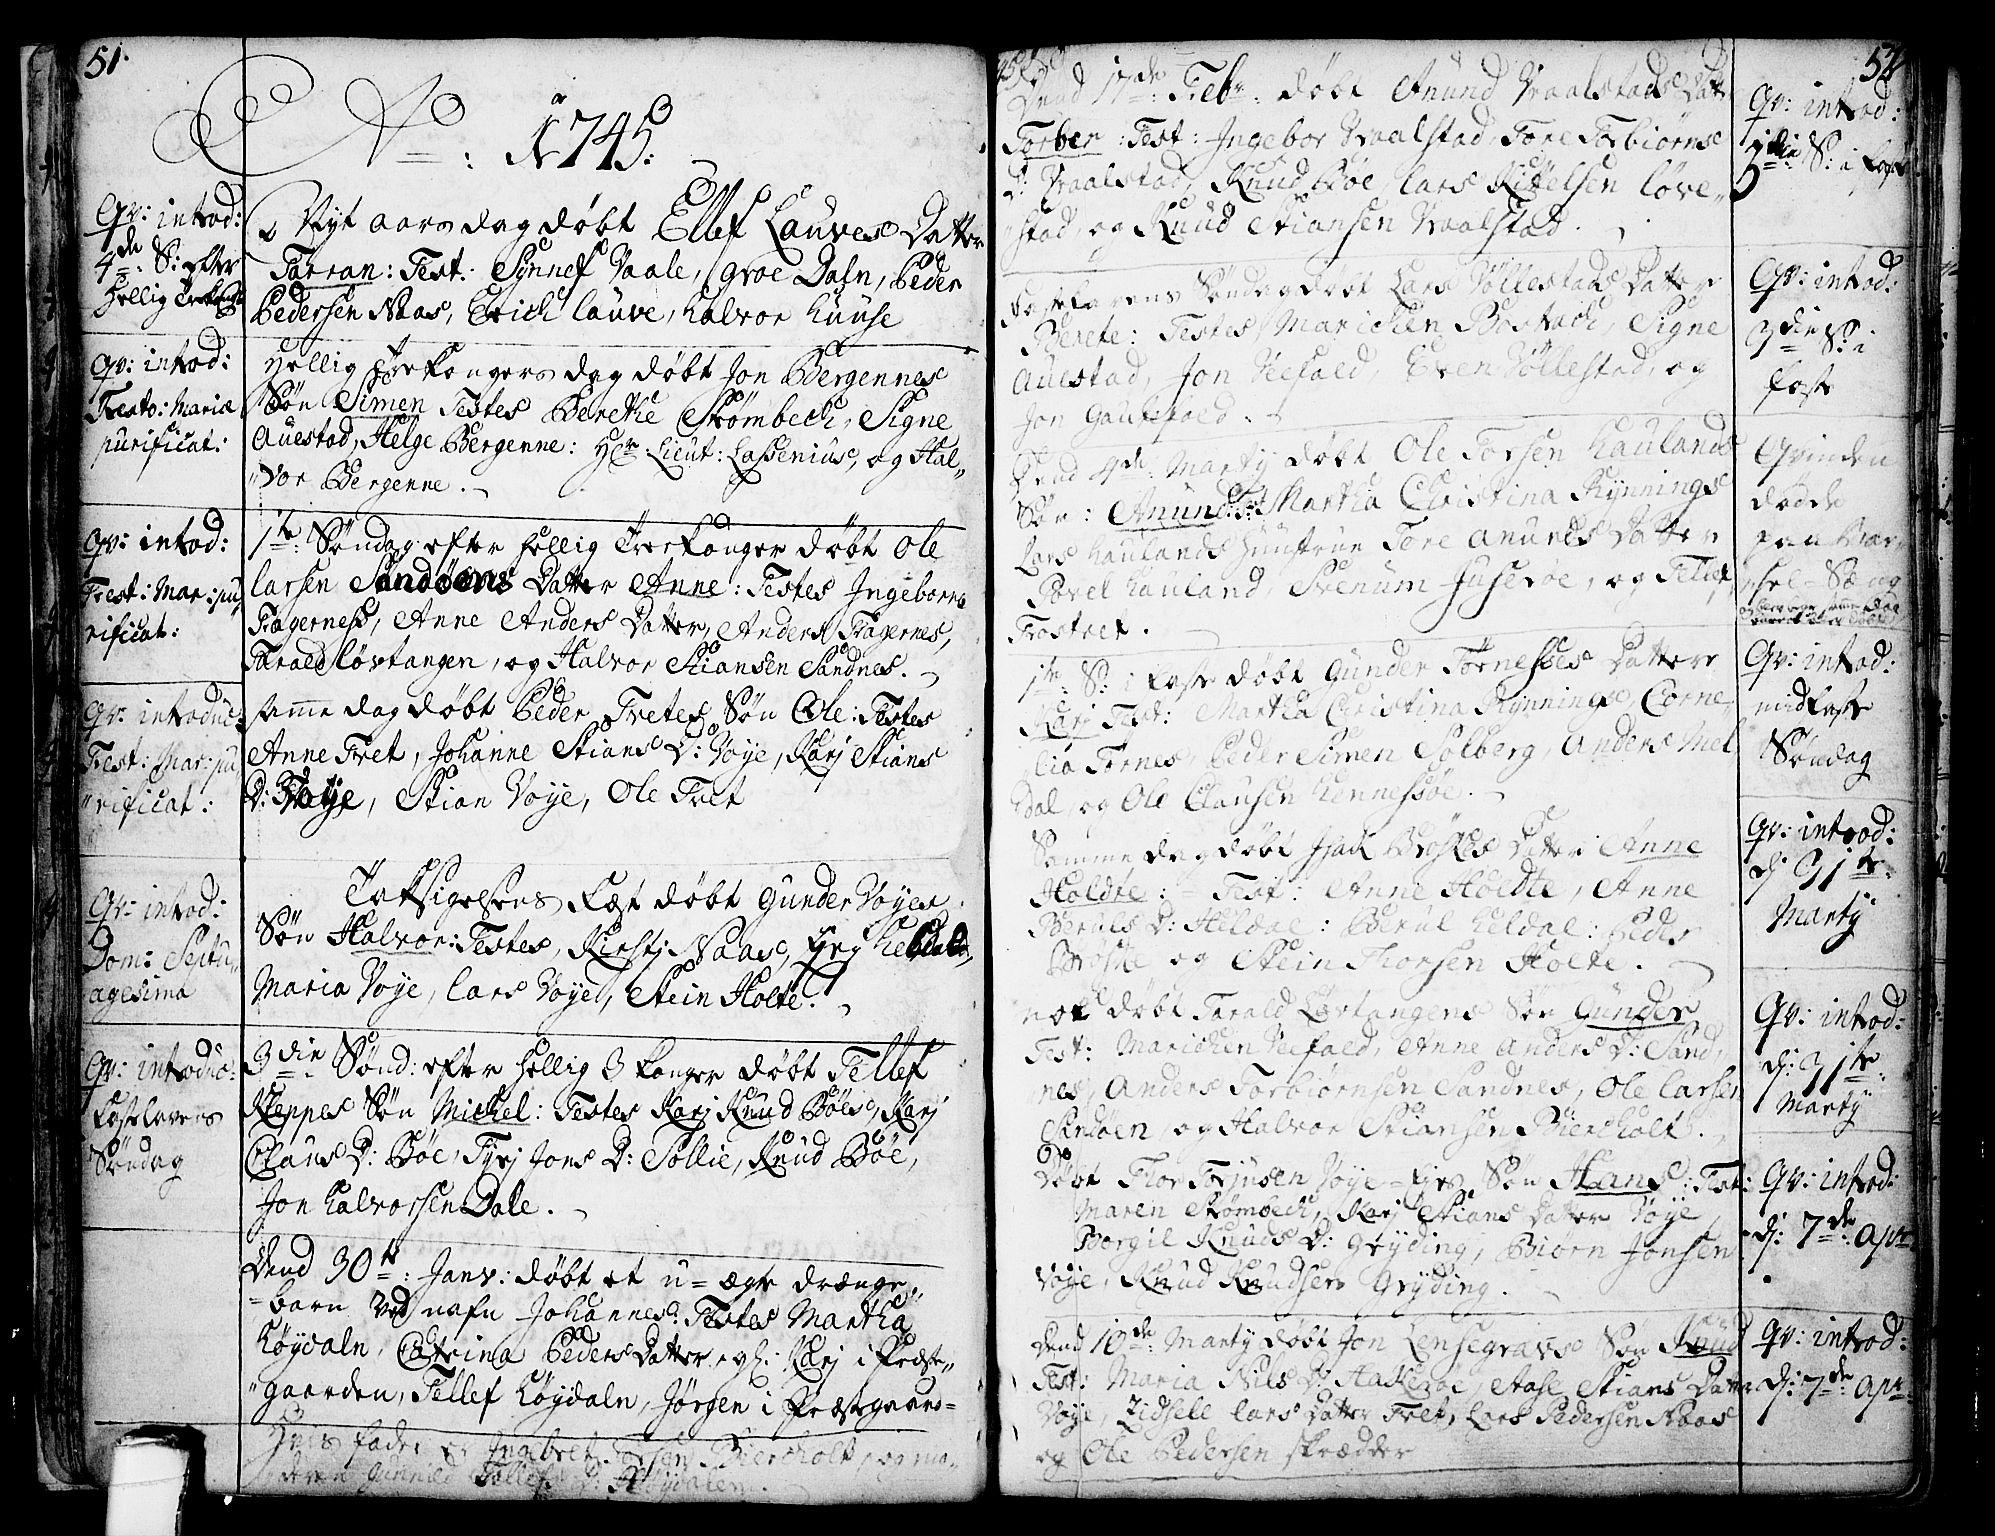 SAKO, Drangedal kirkebøker, F/Fa/L0002: Ministerialbok nr. 2, 1733-1753, s. 51-52